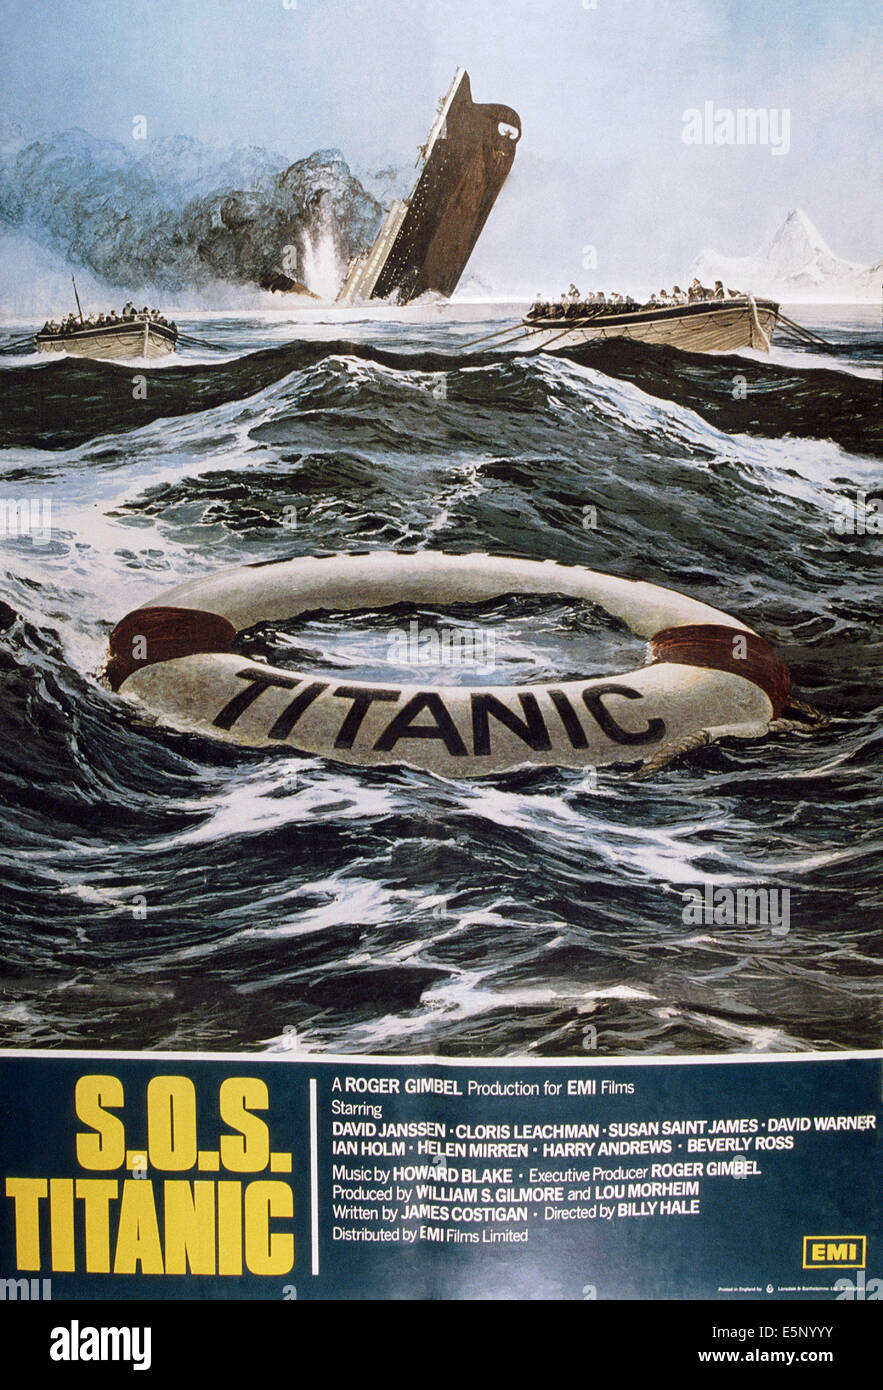 S.O.S. TITANIC, britische Plakat, 1979, © ABC/Courtesy Everett Collection Stockbild